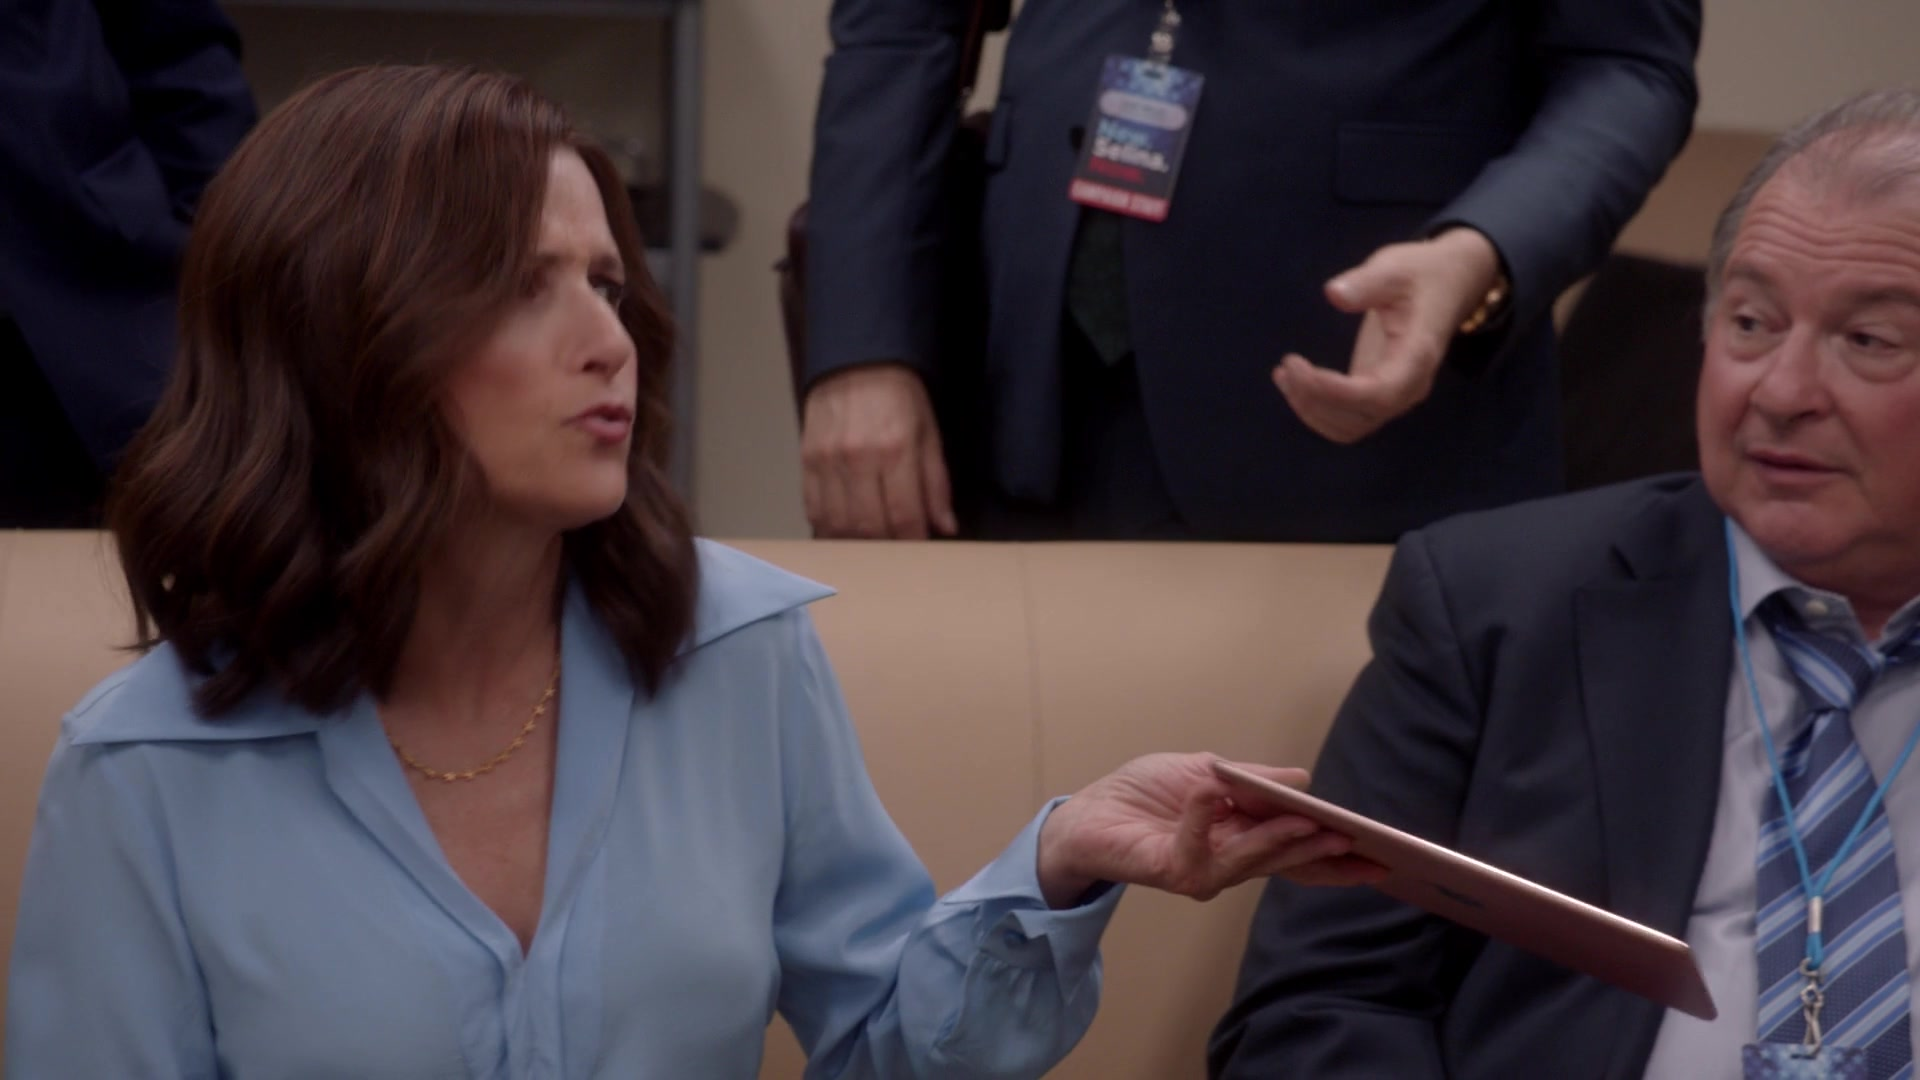 Apple iPad Tablet in Veep - Season 7 Episode 3, Pledge (2019